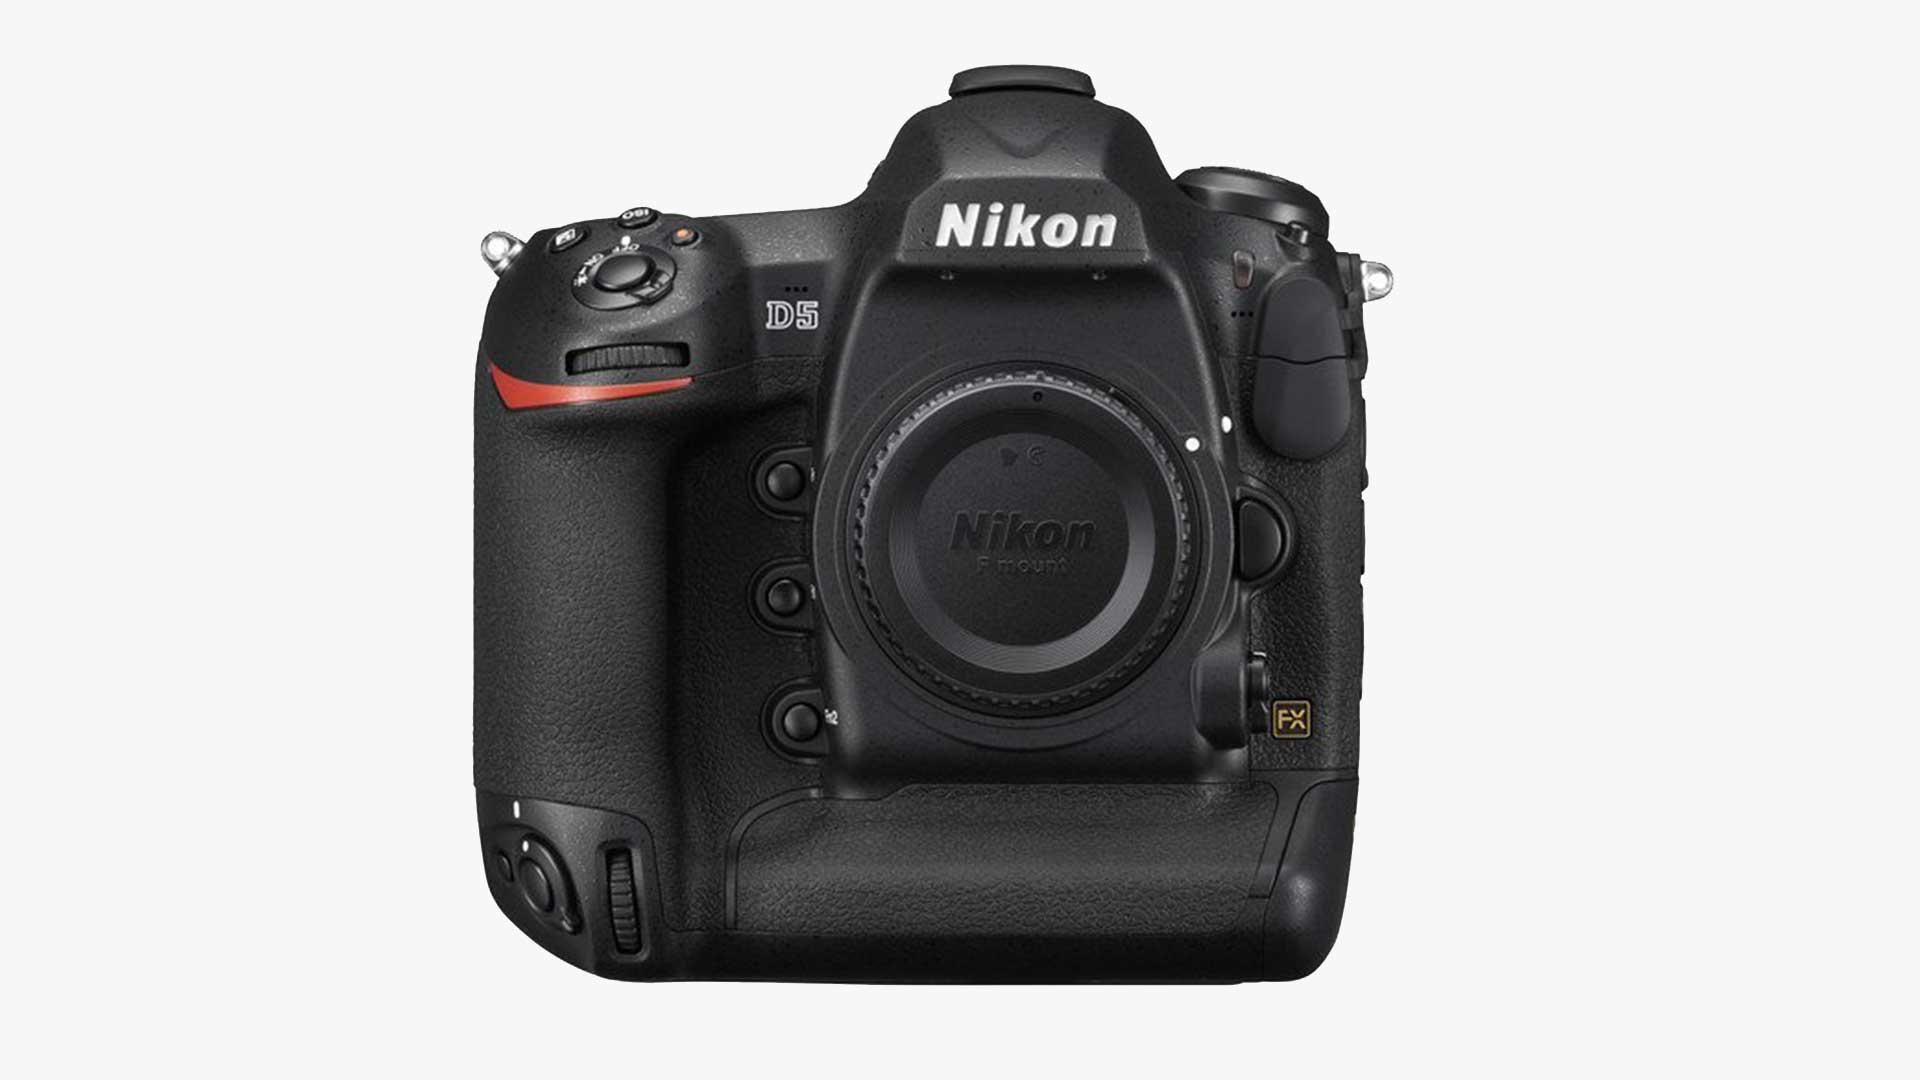 Nikon D5 Ful Frame Camera